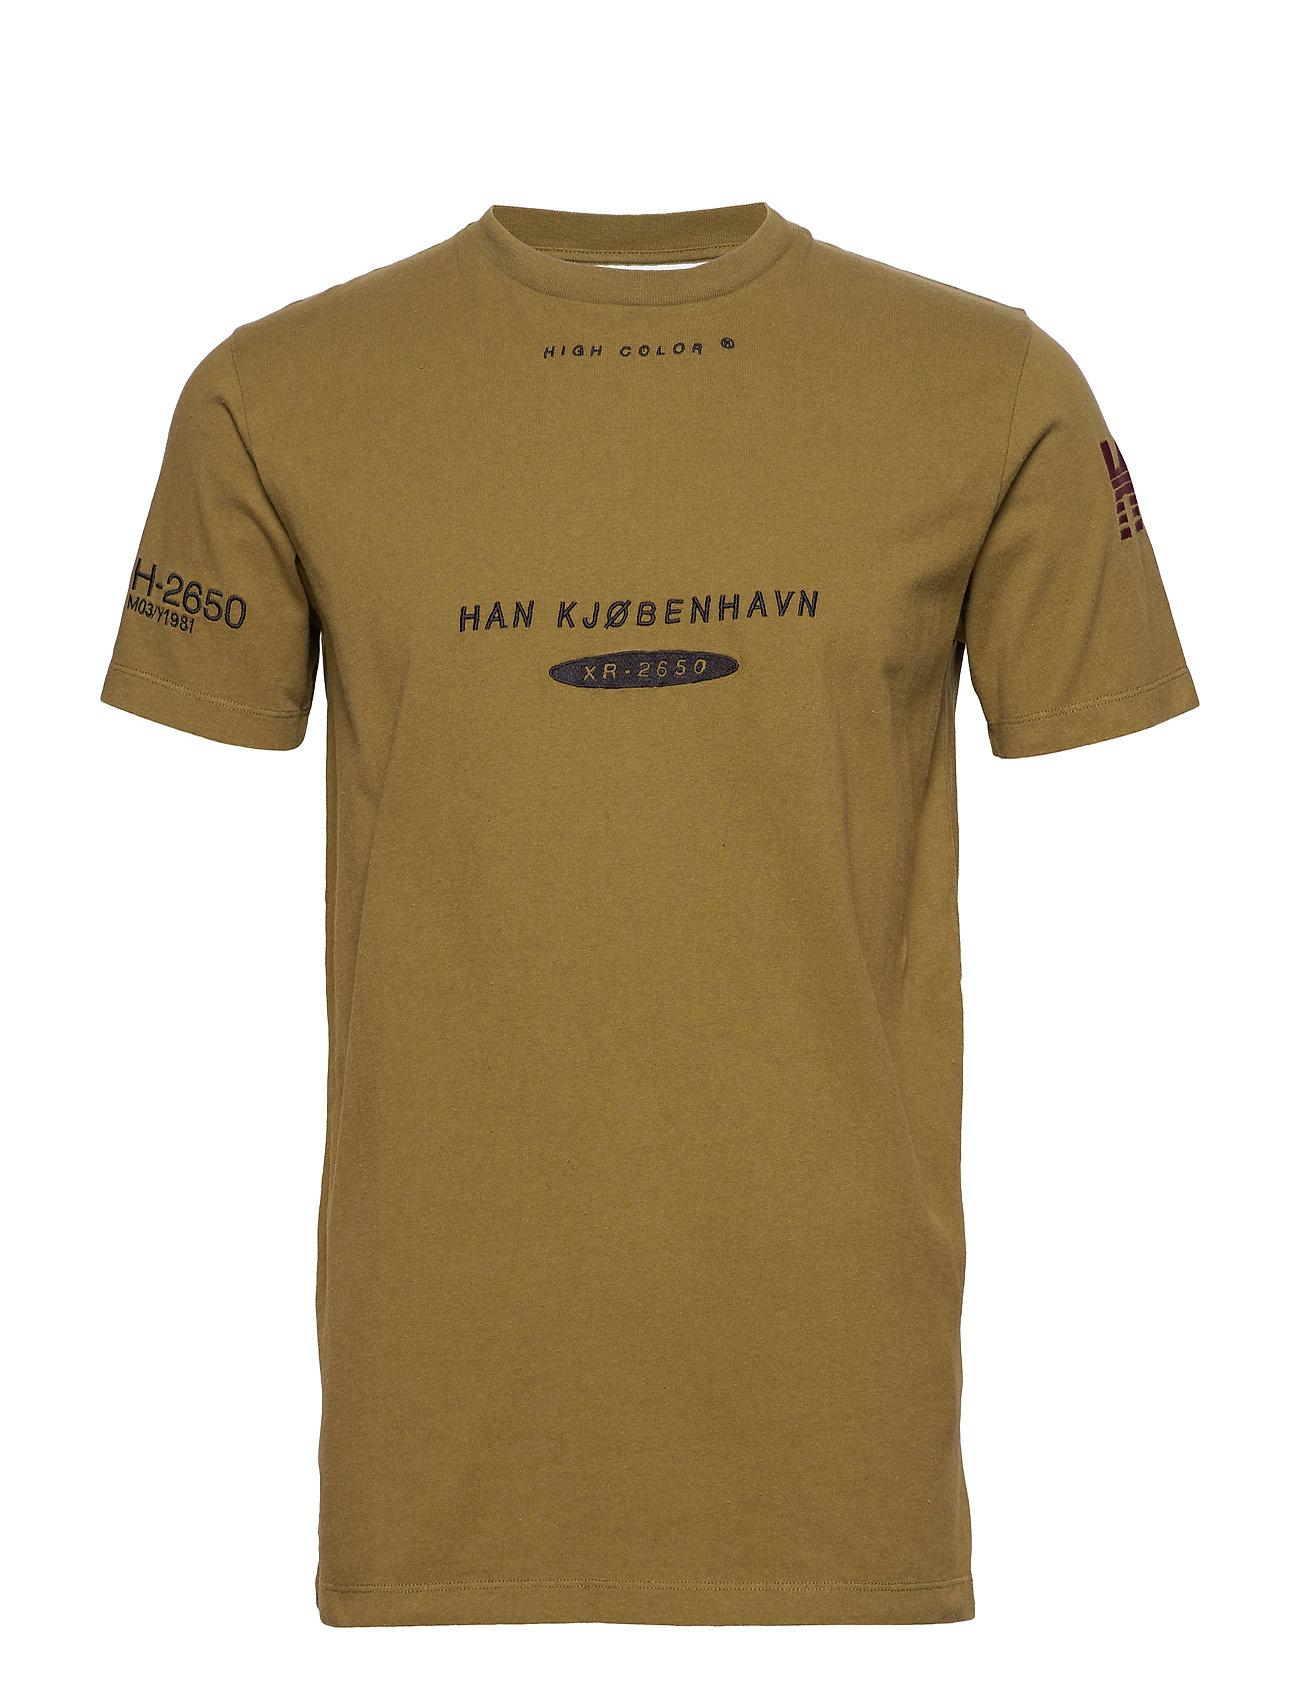 3c6f235c9b3 HAN Kjøbenhavn Clothing Casual Tee (Olive), (45 €) | Large selection ...